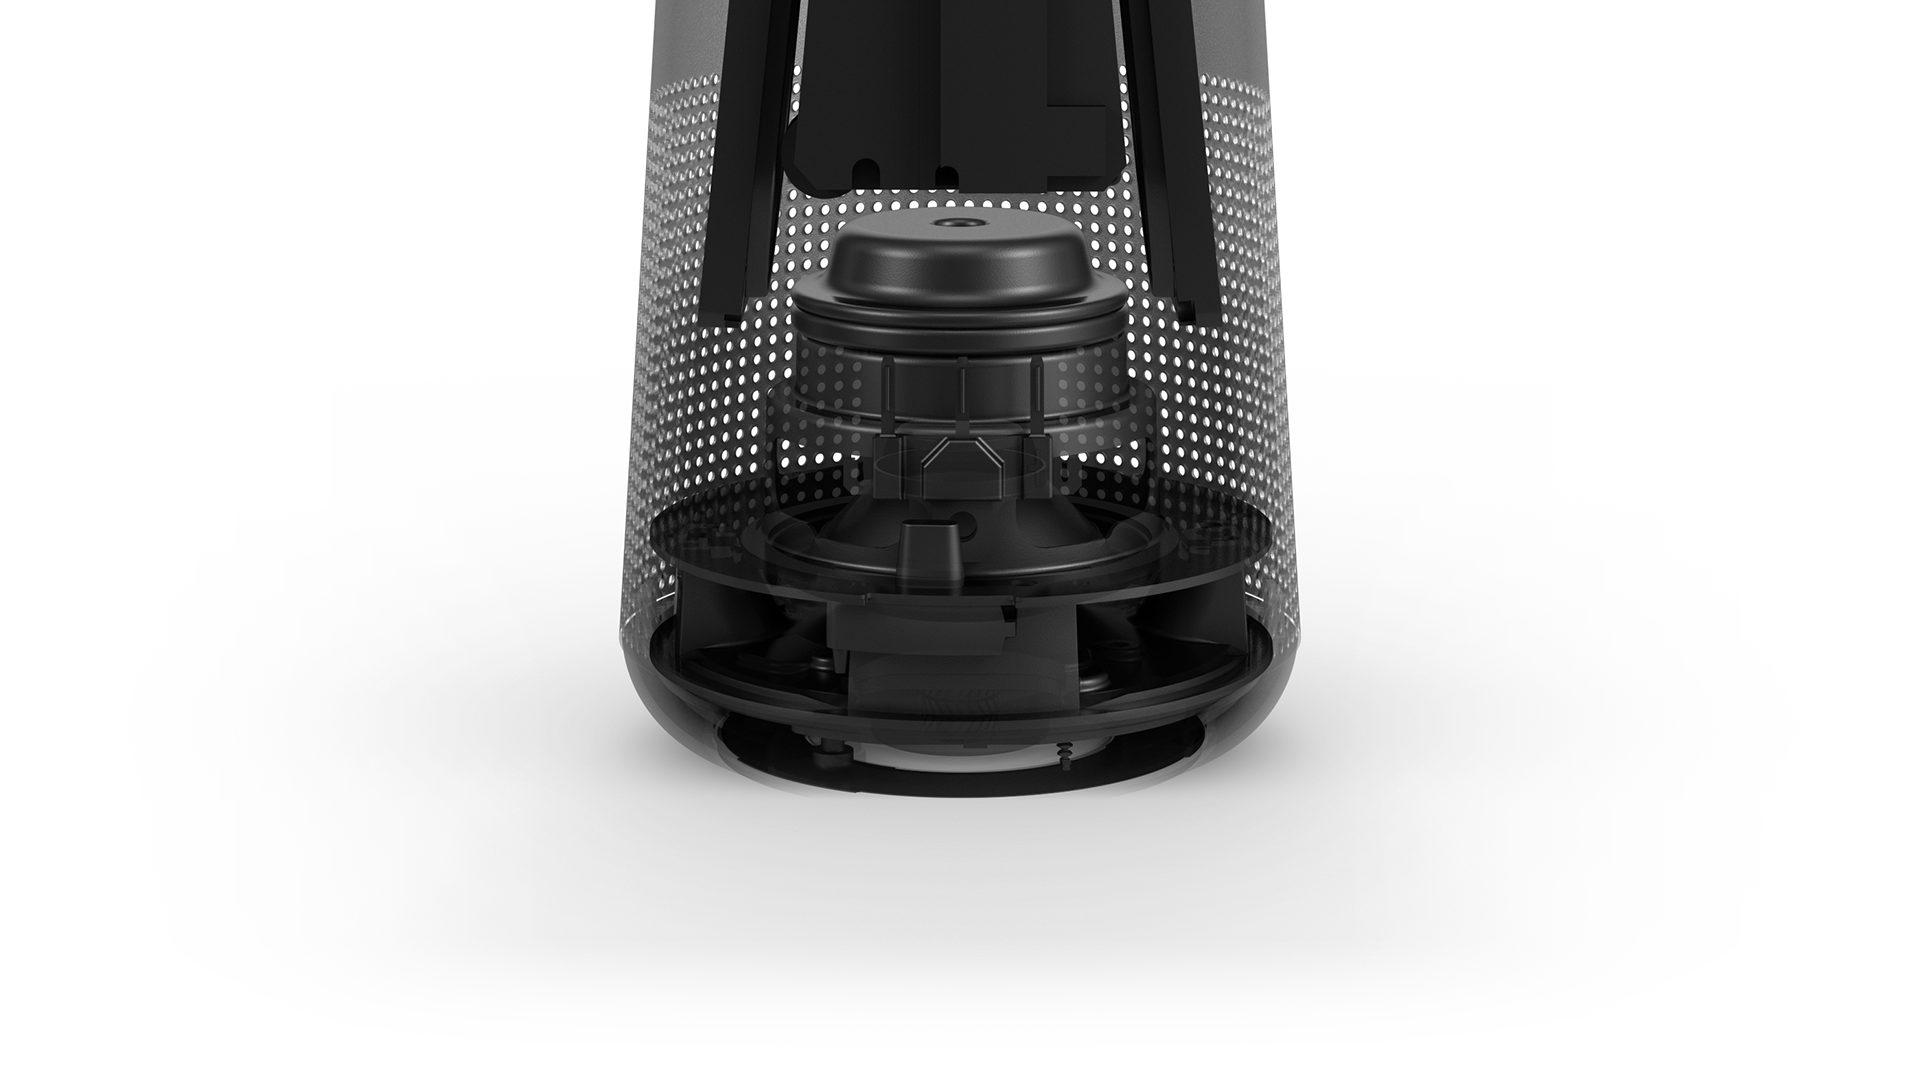 The inside of the SoundLink Revolve Bluetooth speaker